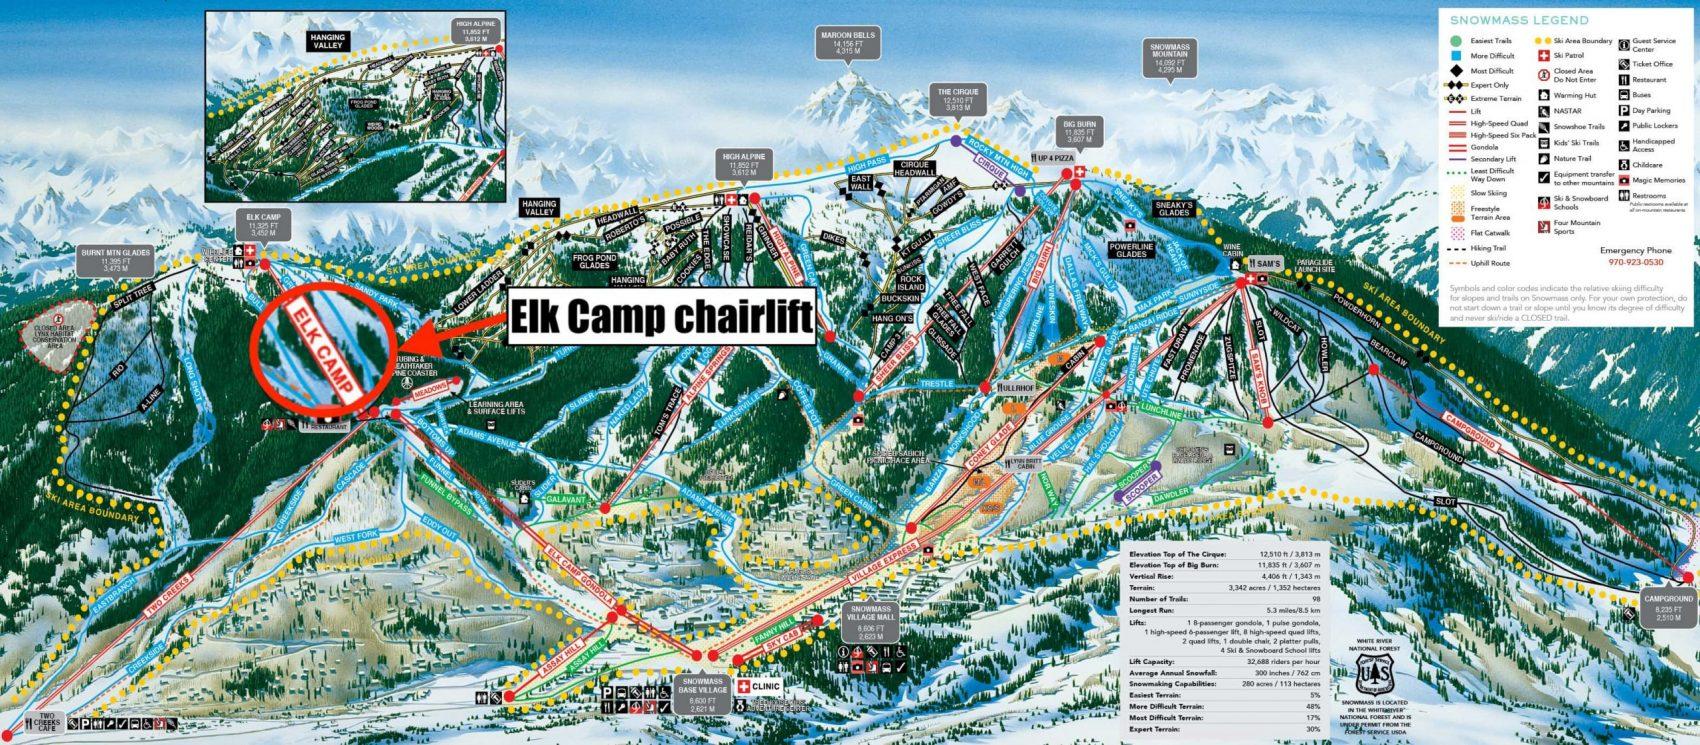 snowmass, colorado, trail map, aspen